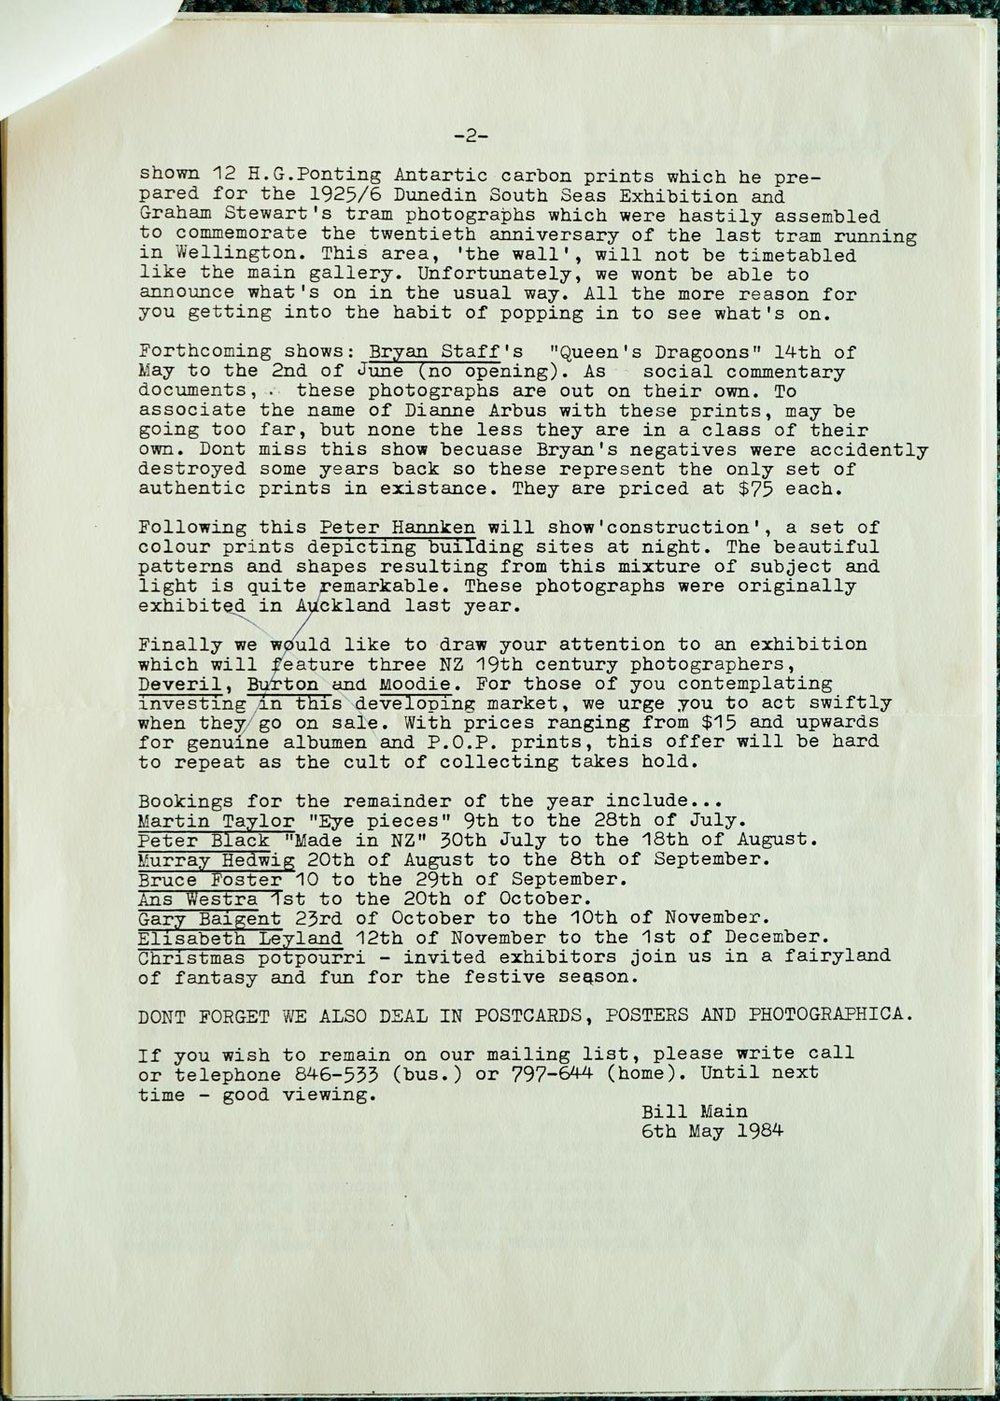 Exposures  Gallery Newsletter No.1, 6 May 1984